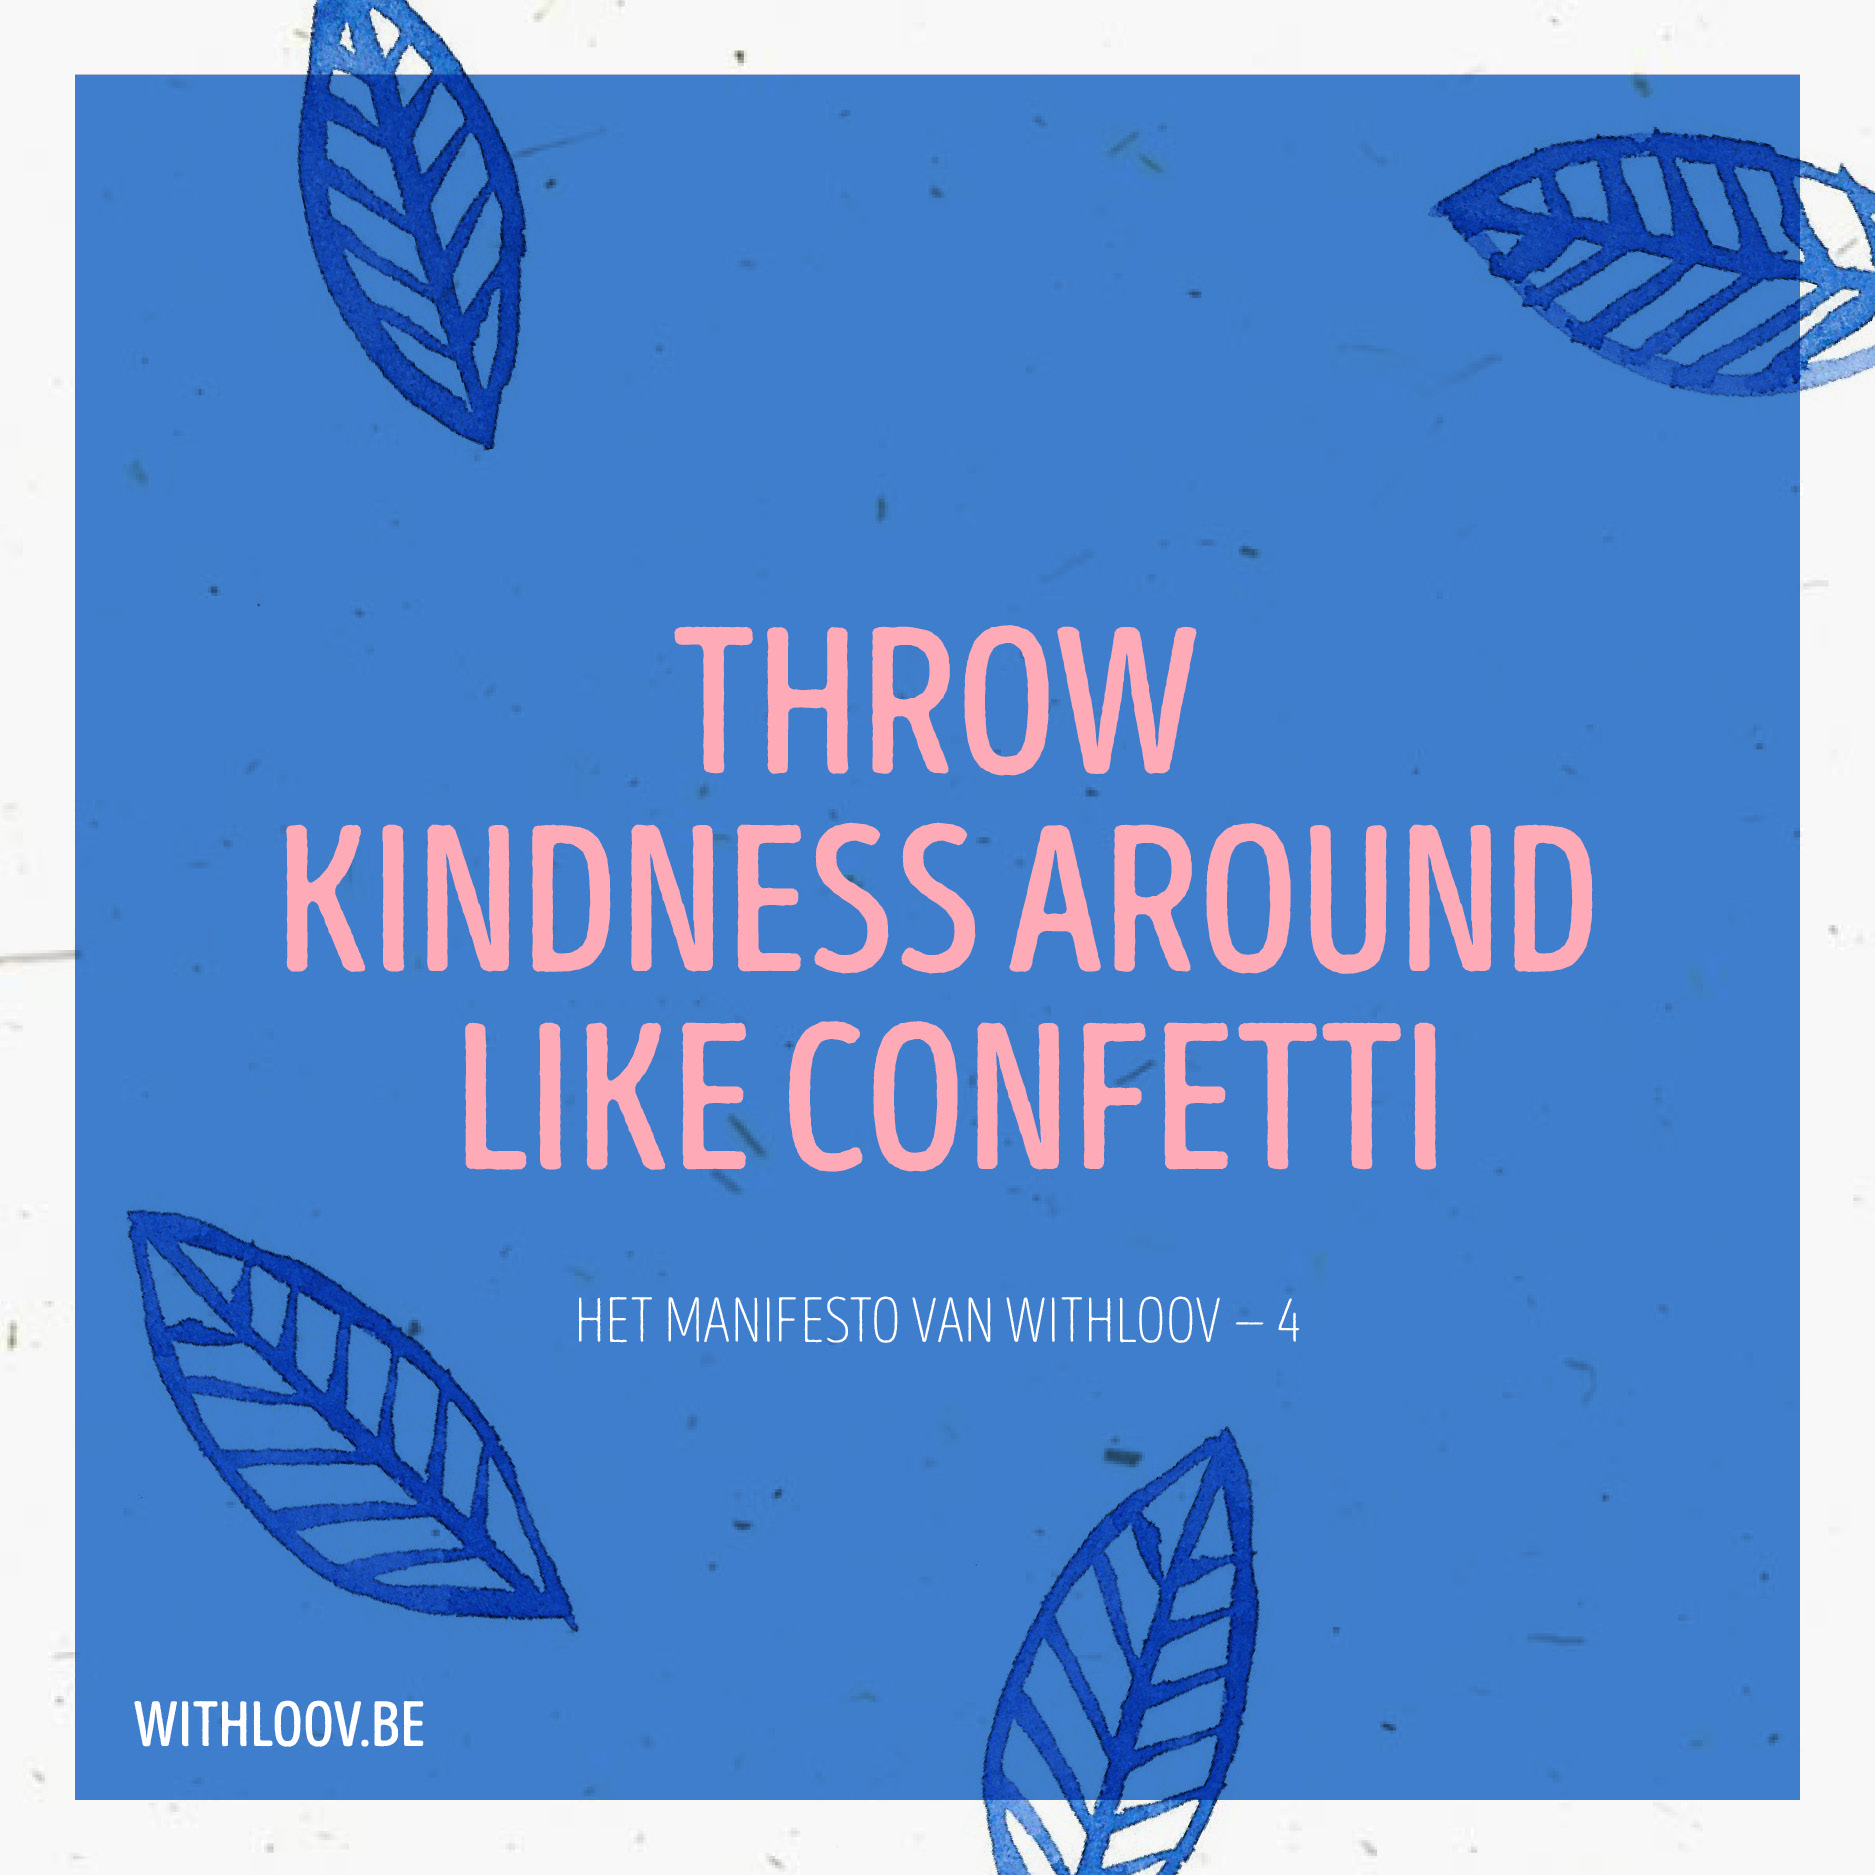 Withloov manifesto Throw kindness around like confettie